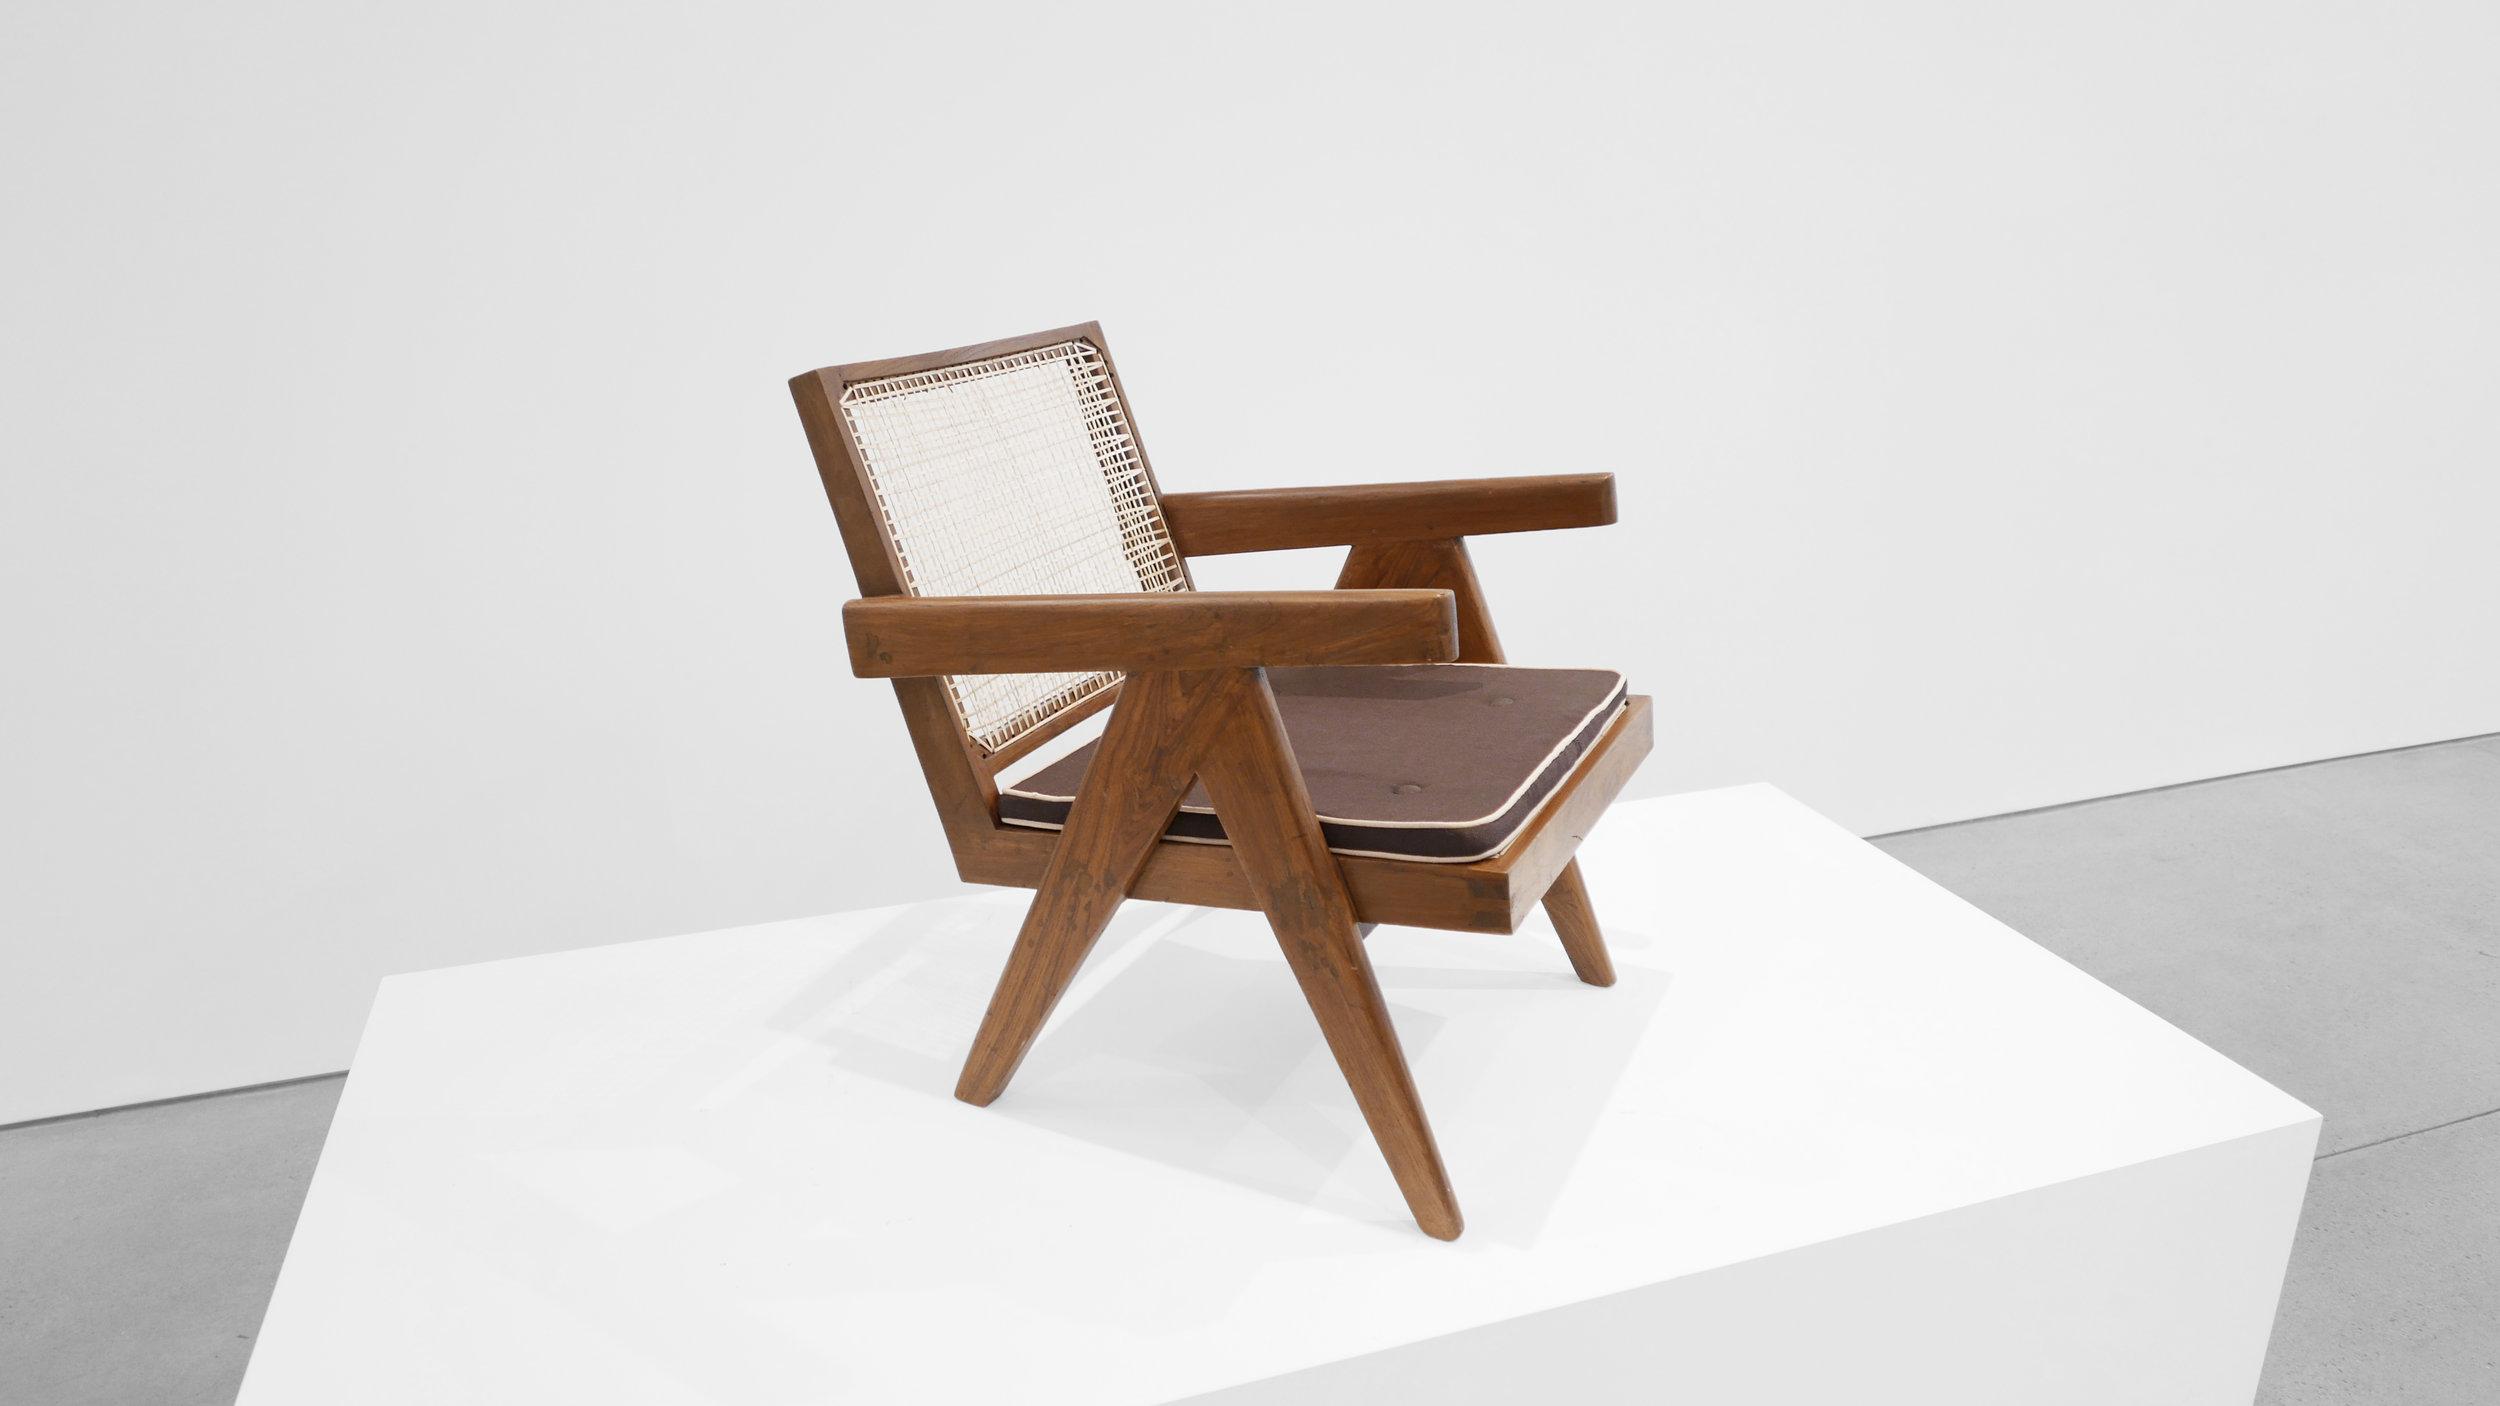 Pierre Jeanneret, Low lounge chair, model PJ-SI-29-A, c. 1955, teak, cane, 24.5H x 20.5W x 29.5D inches_3.jpg